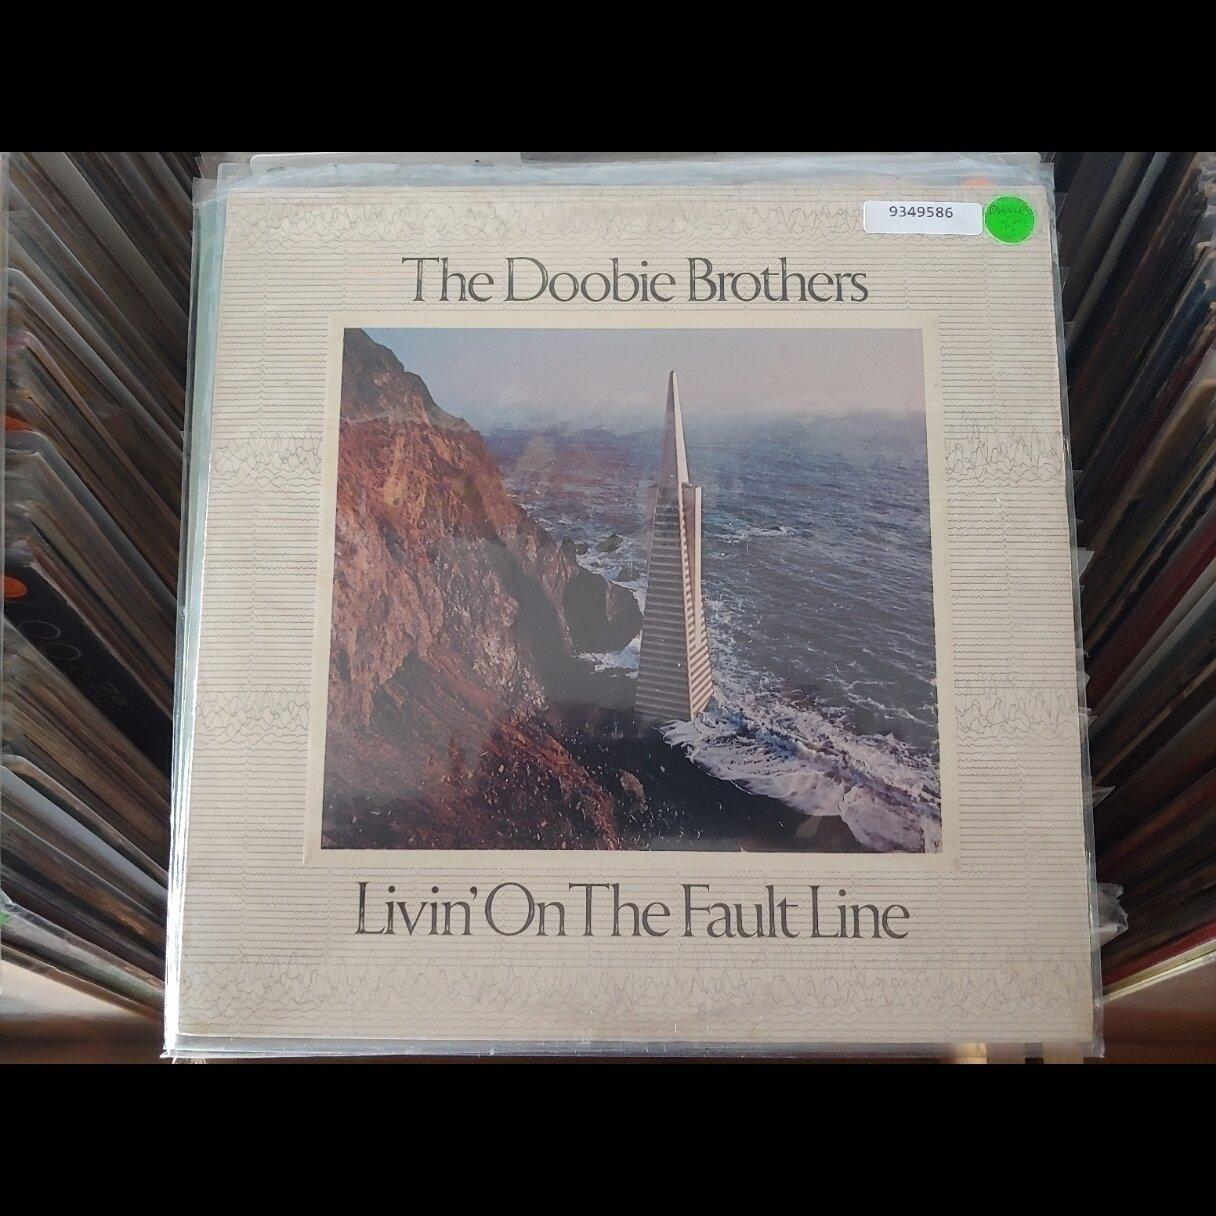 Doobie BROTHERs Livin on the fault line